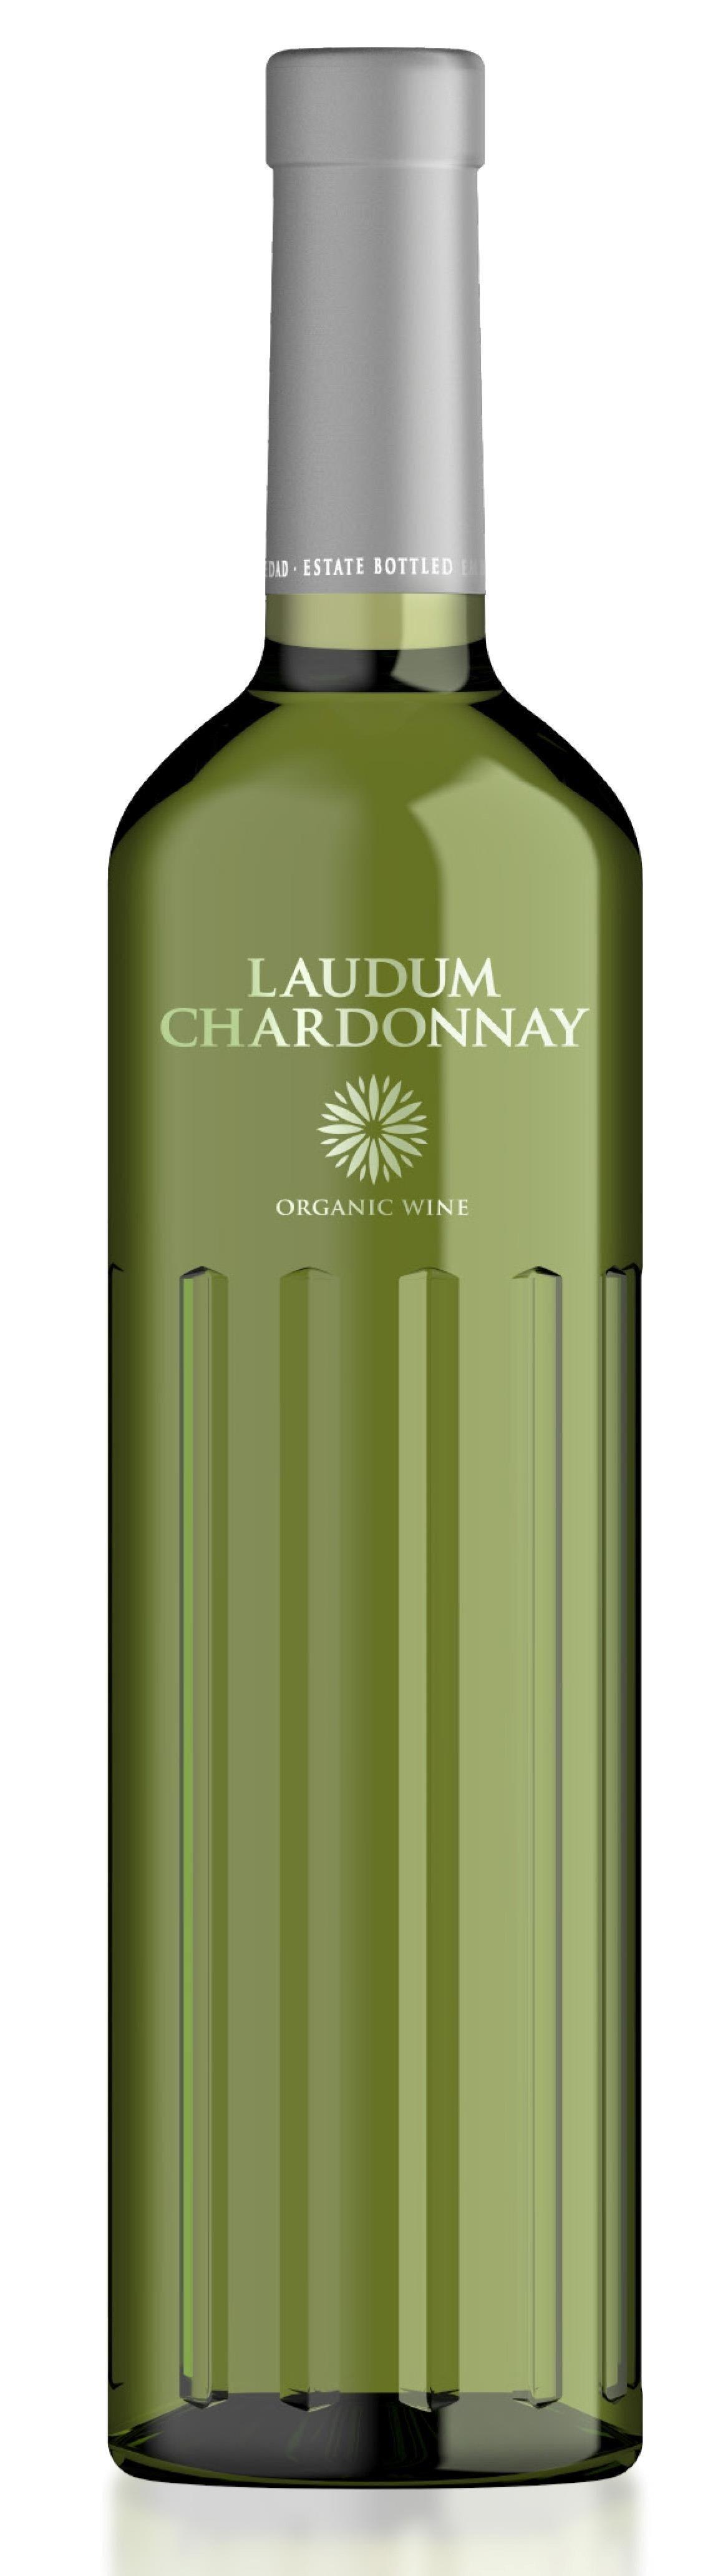 Image of   Laudum Chardonnay Joven (Økologisk)